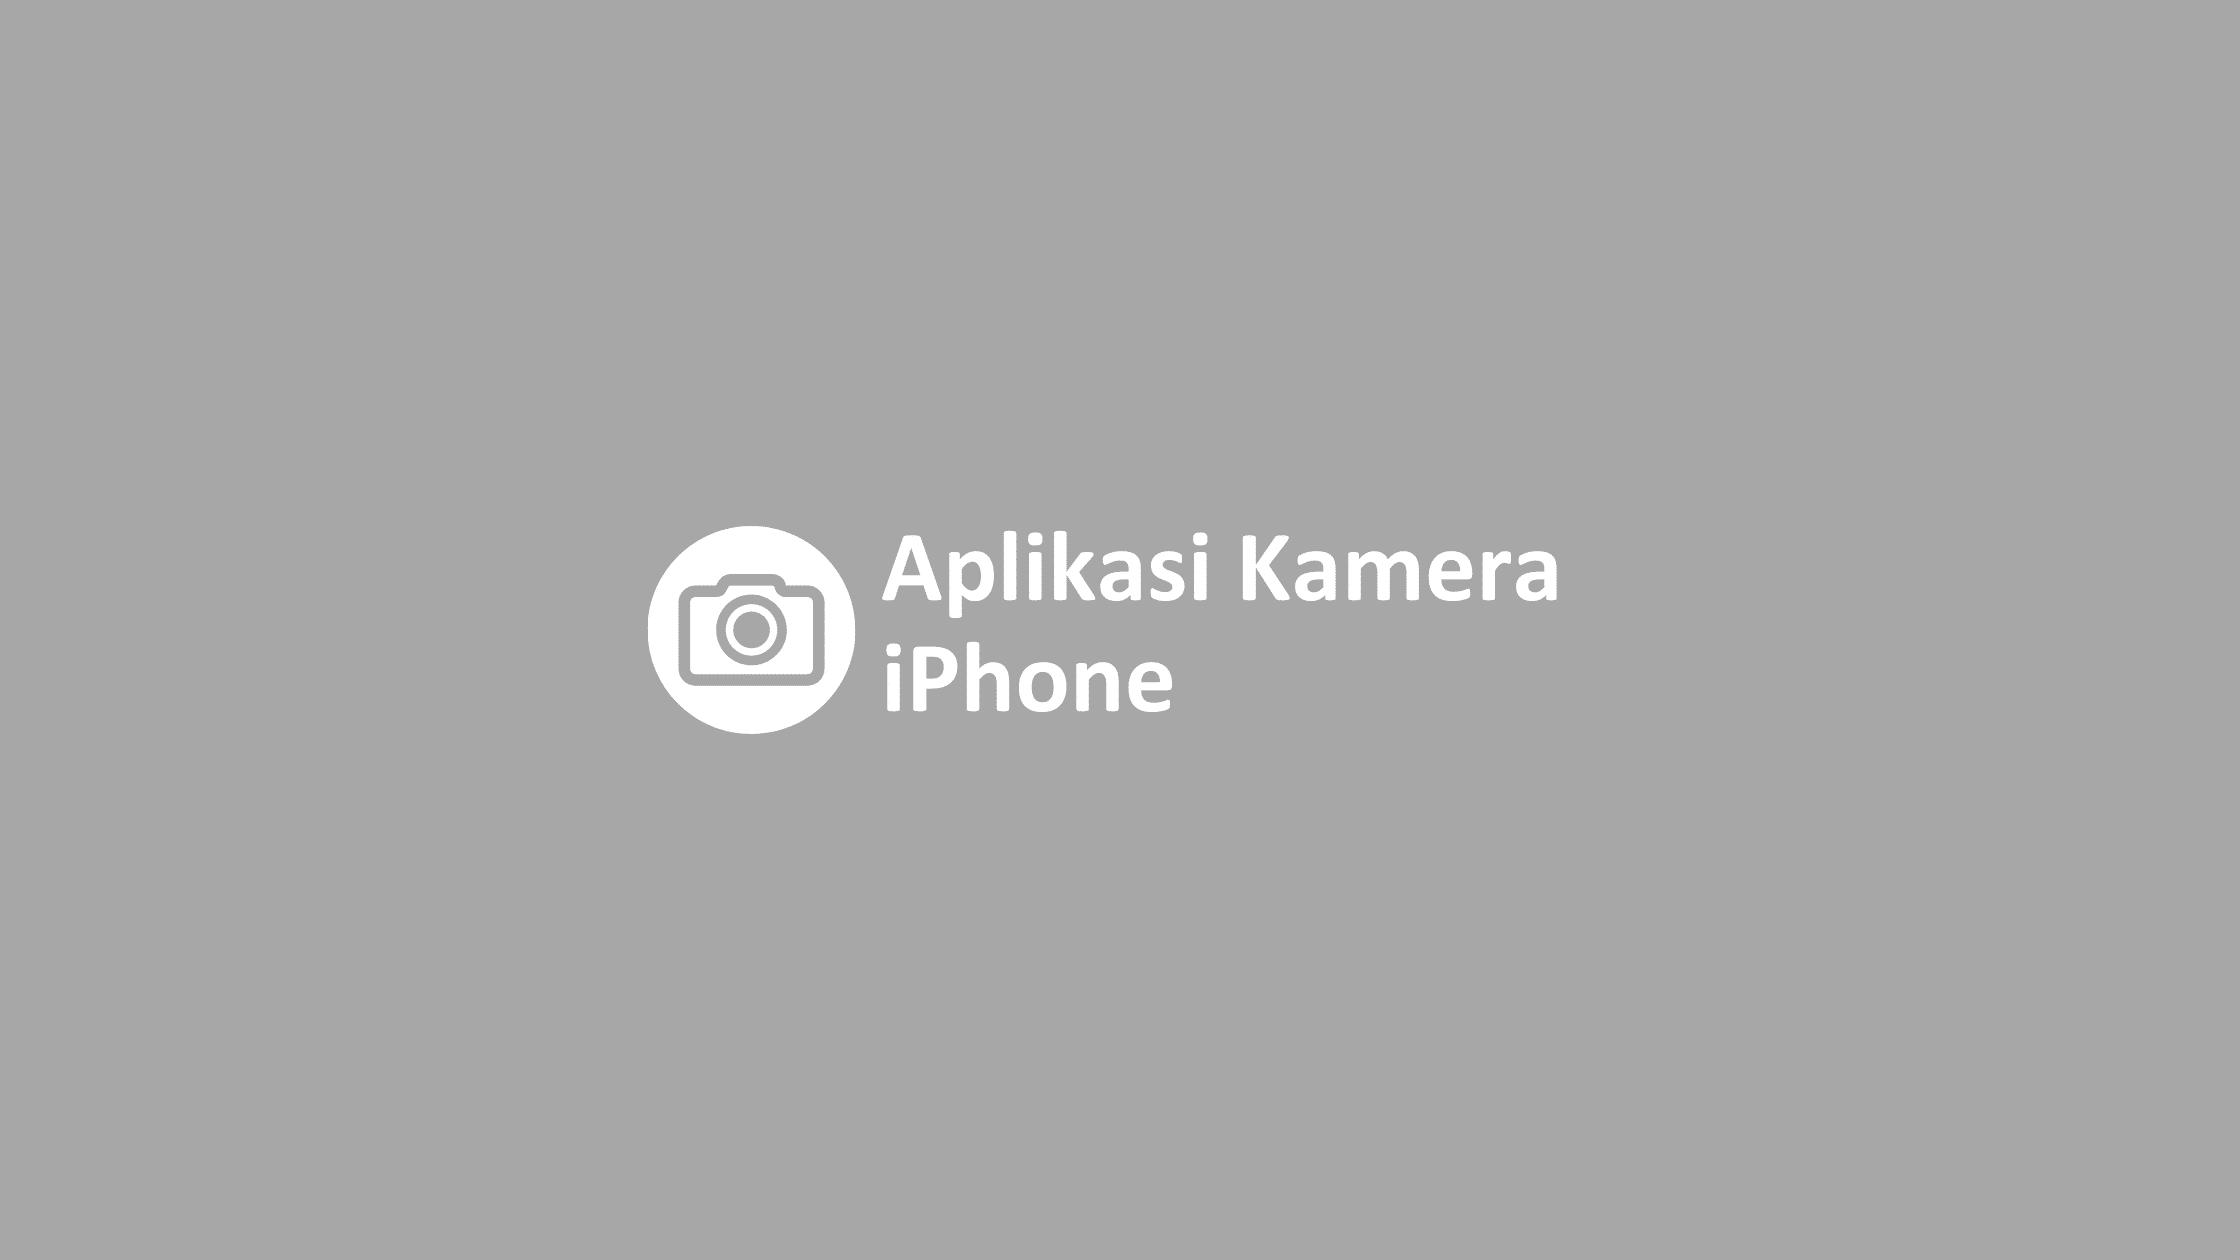 aplikasi kamera iphone